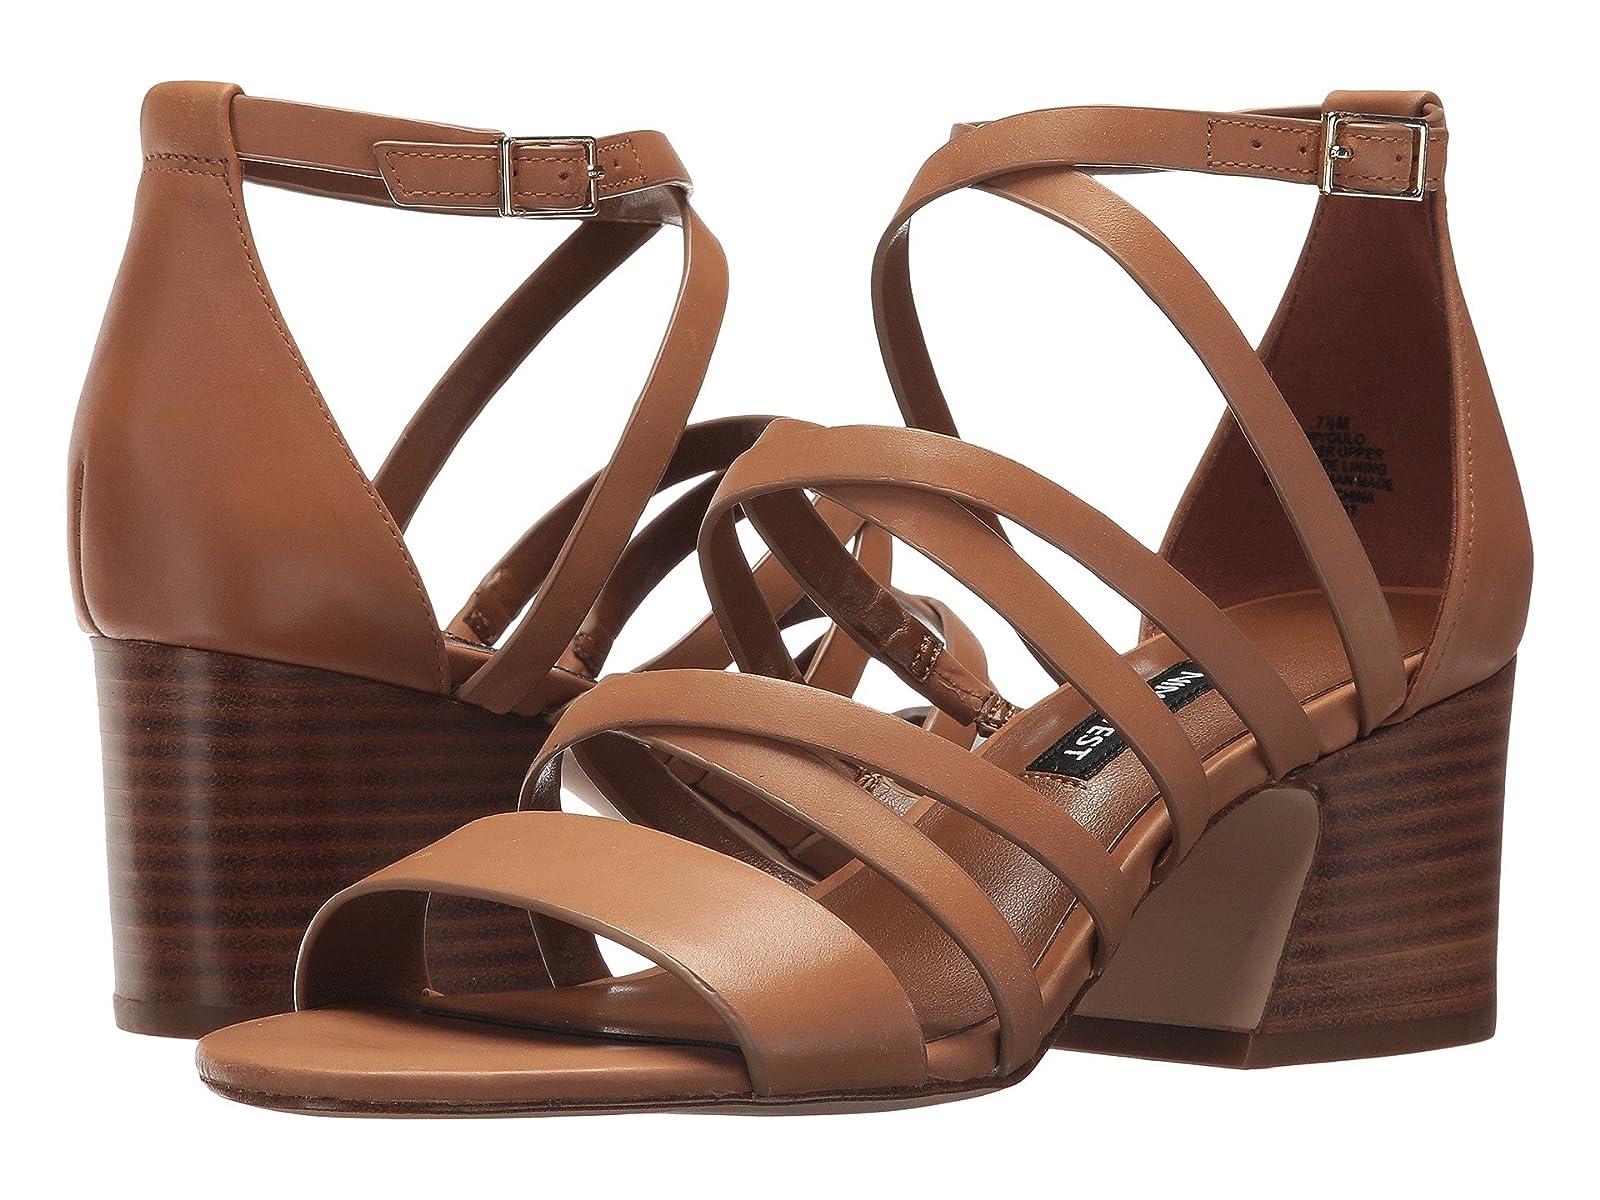 Nine West Youlo Strappy Block Heel SandalAtmospheric grades have affordable shoes